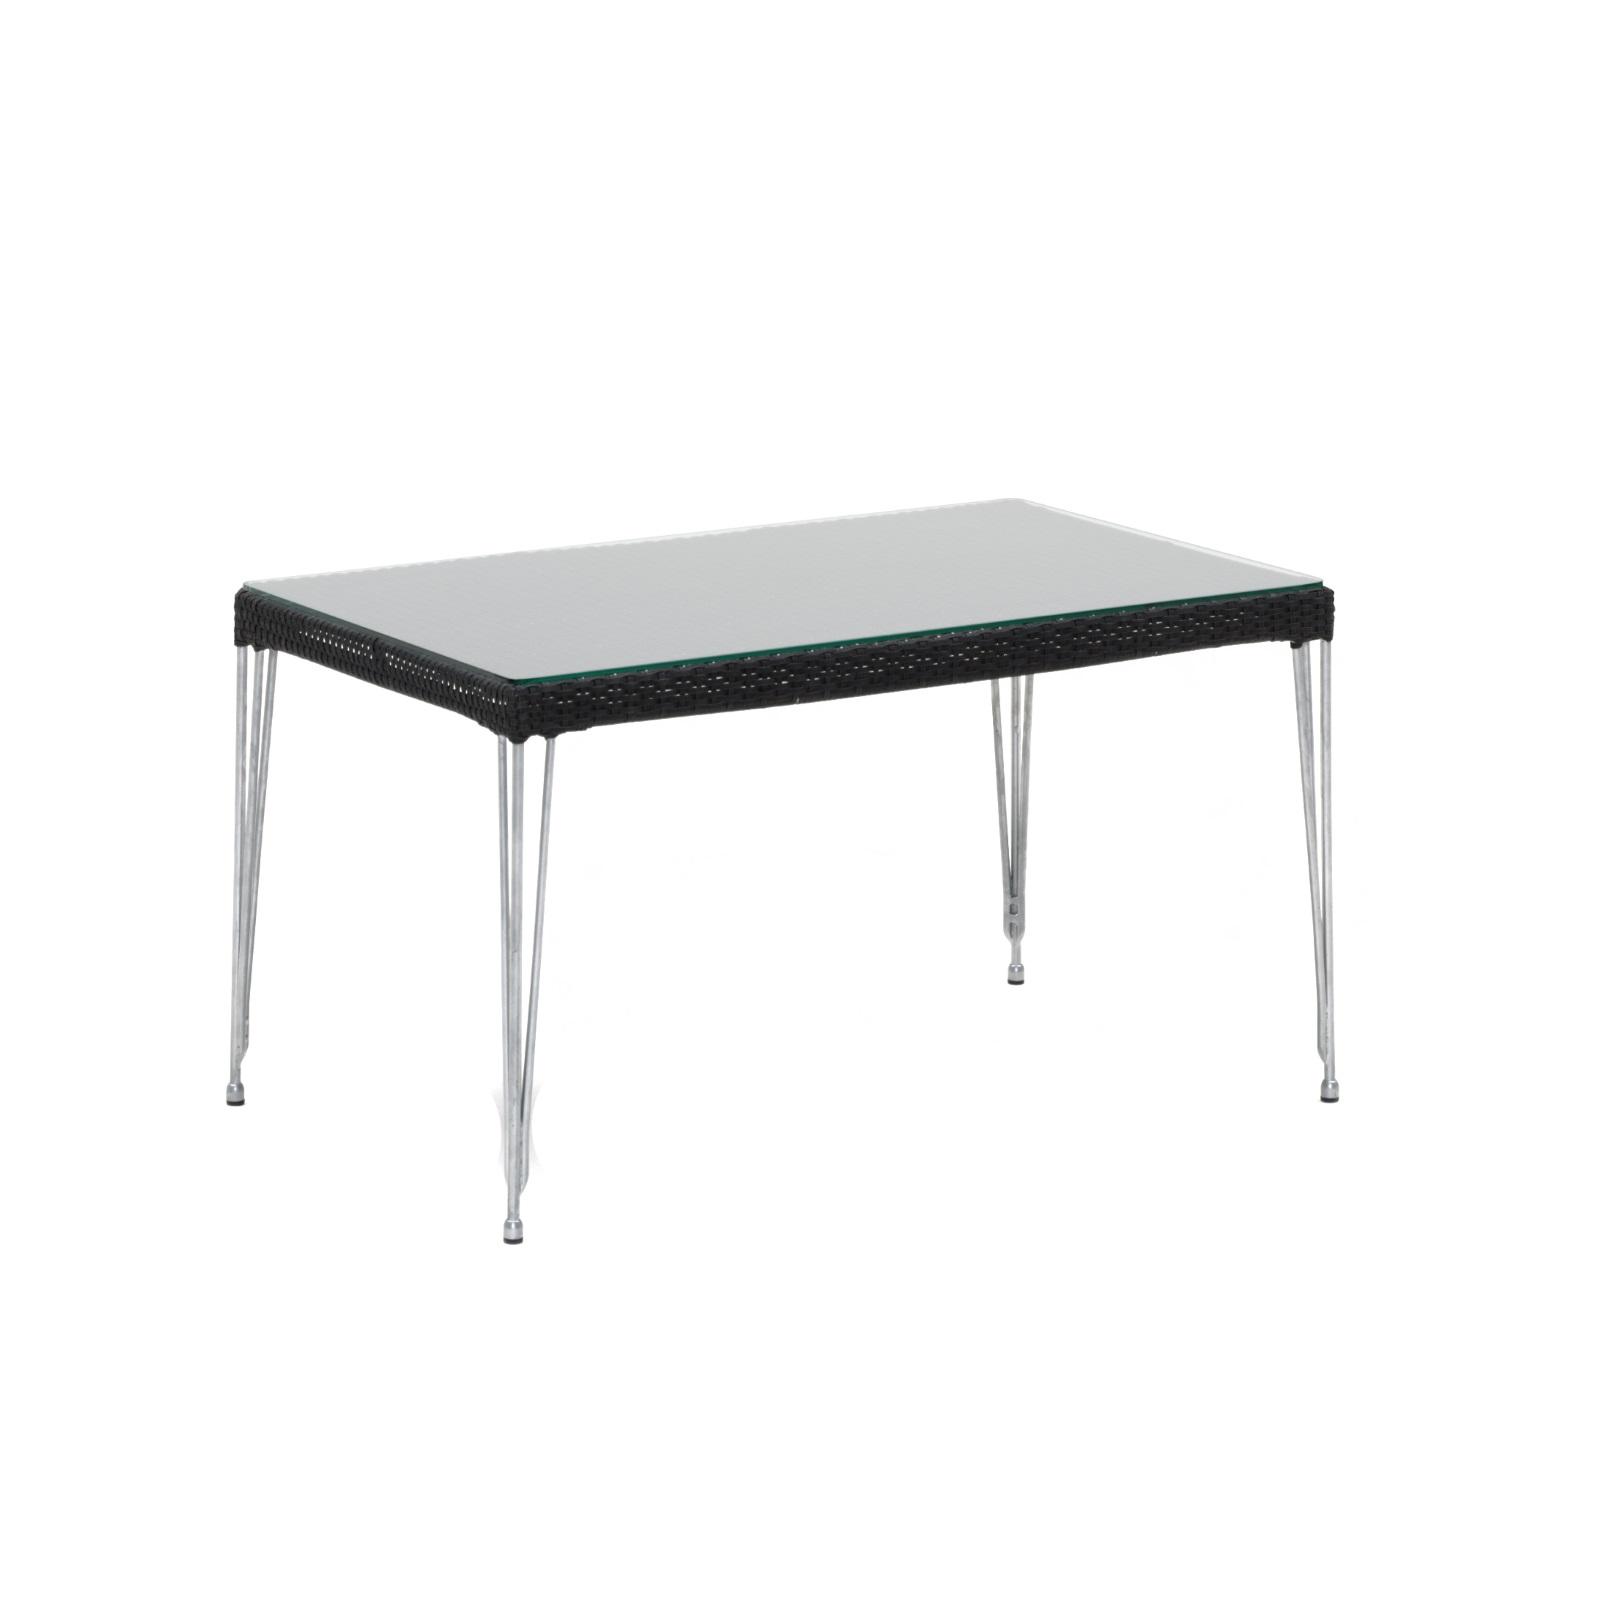 MERCUR soffbord svart konstrotting, Sika-Design